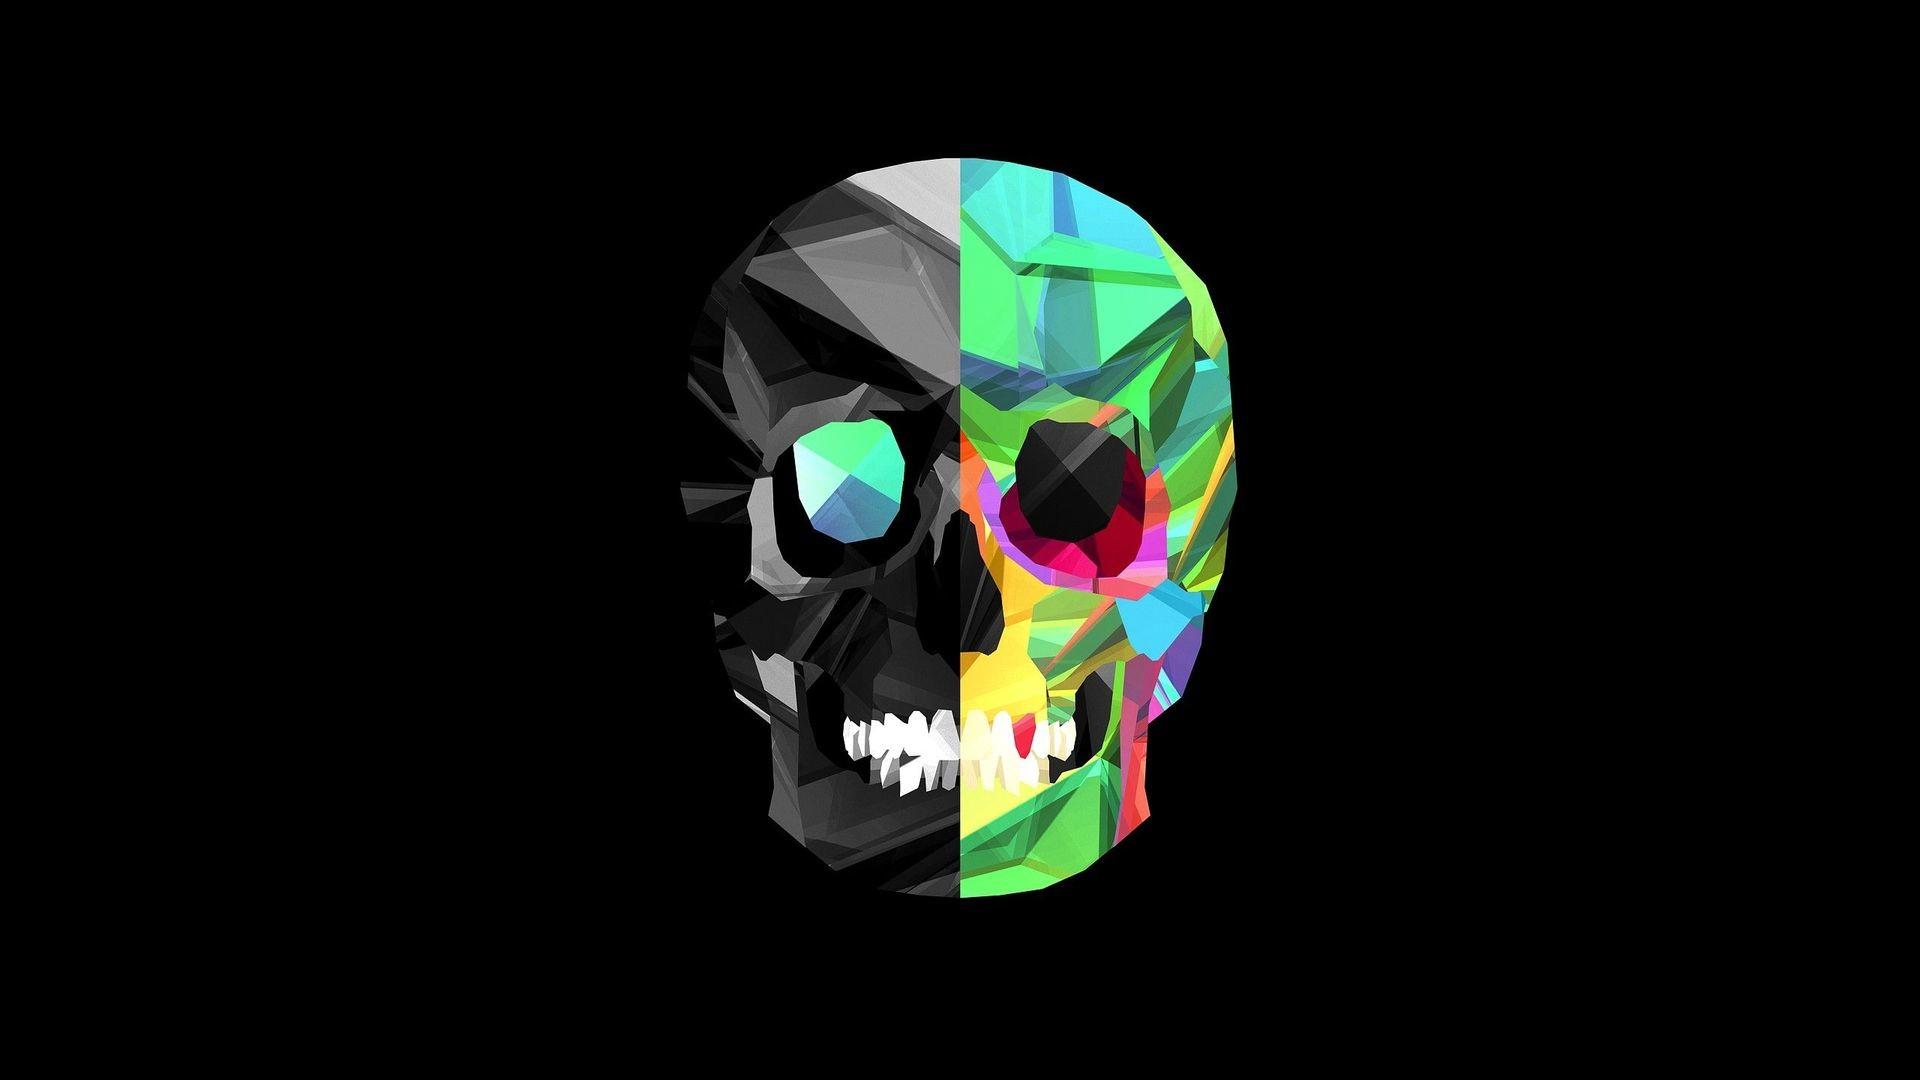 Skeleton Wallpapers for Desktop 2018 (56+ pictures)